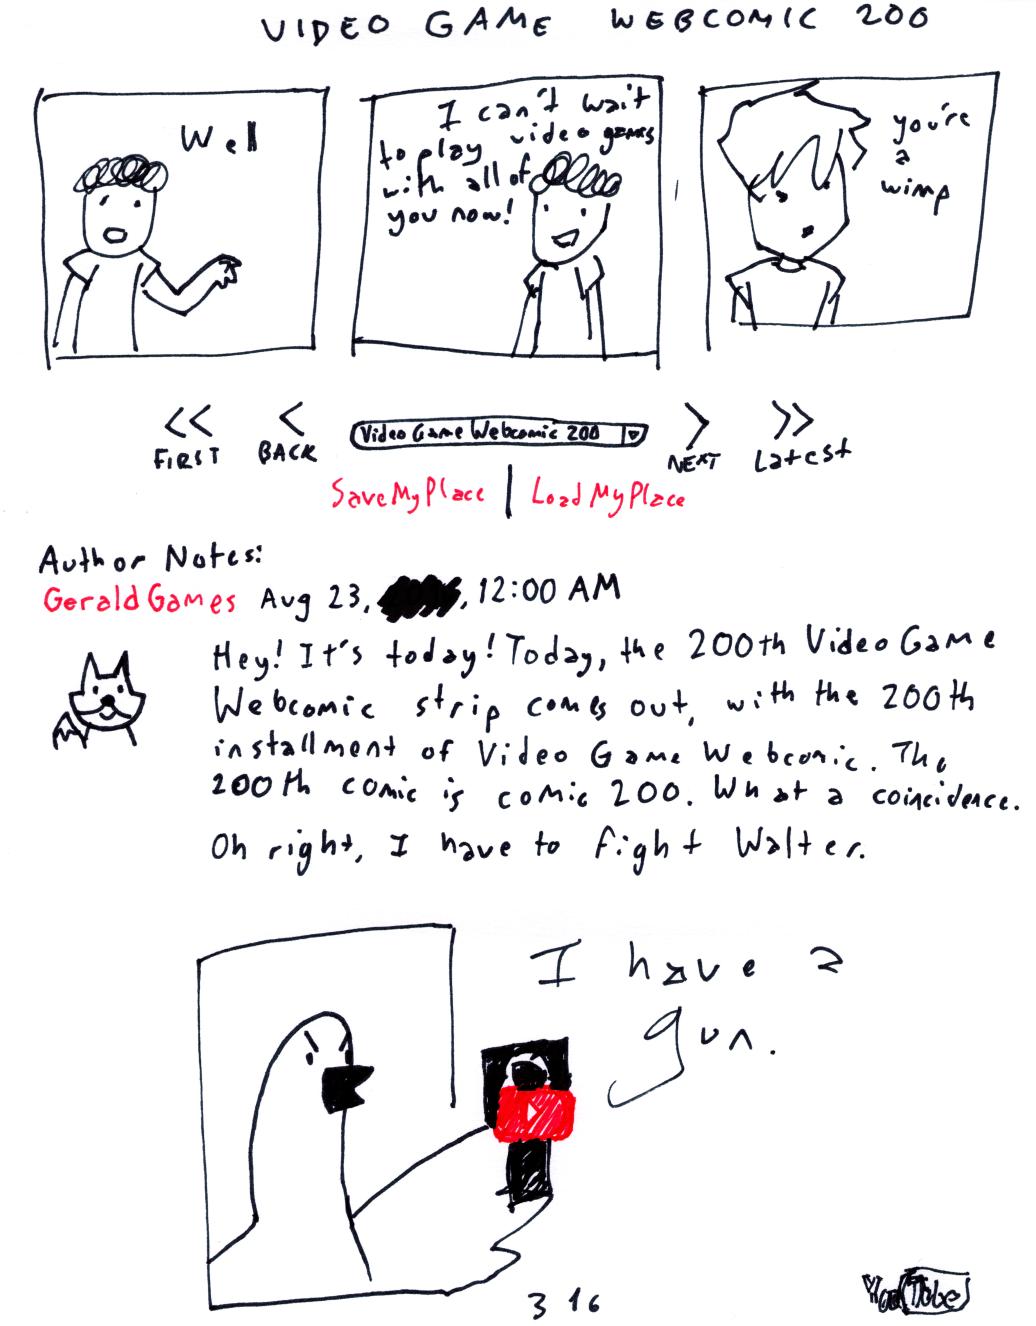 Video Game Webcomic 200